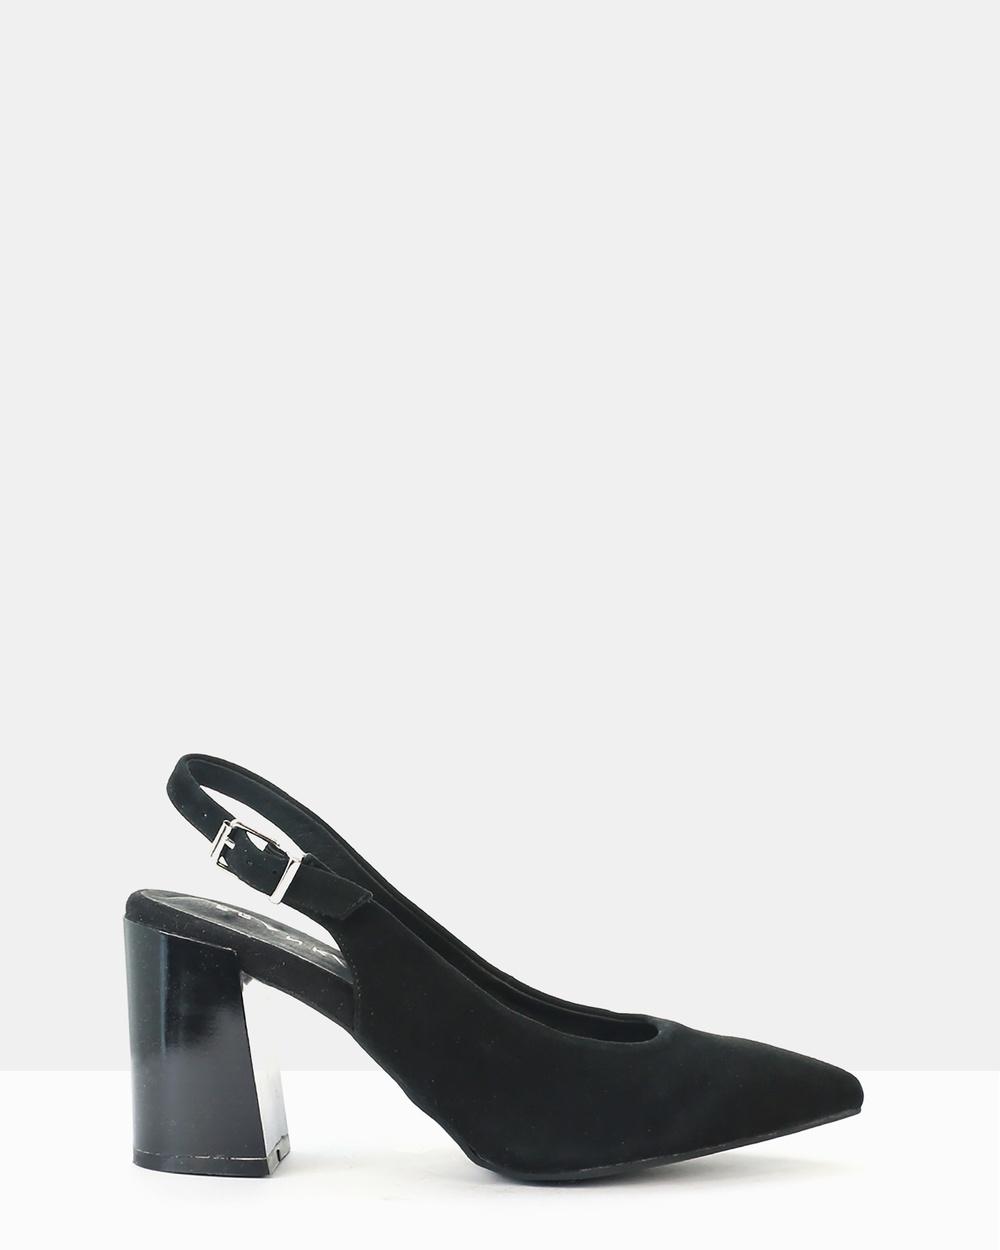 FRANK/E Viral Heels Black Viral